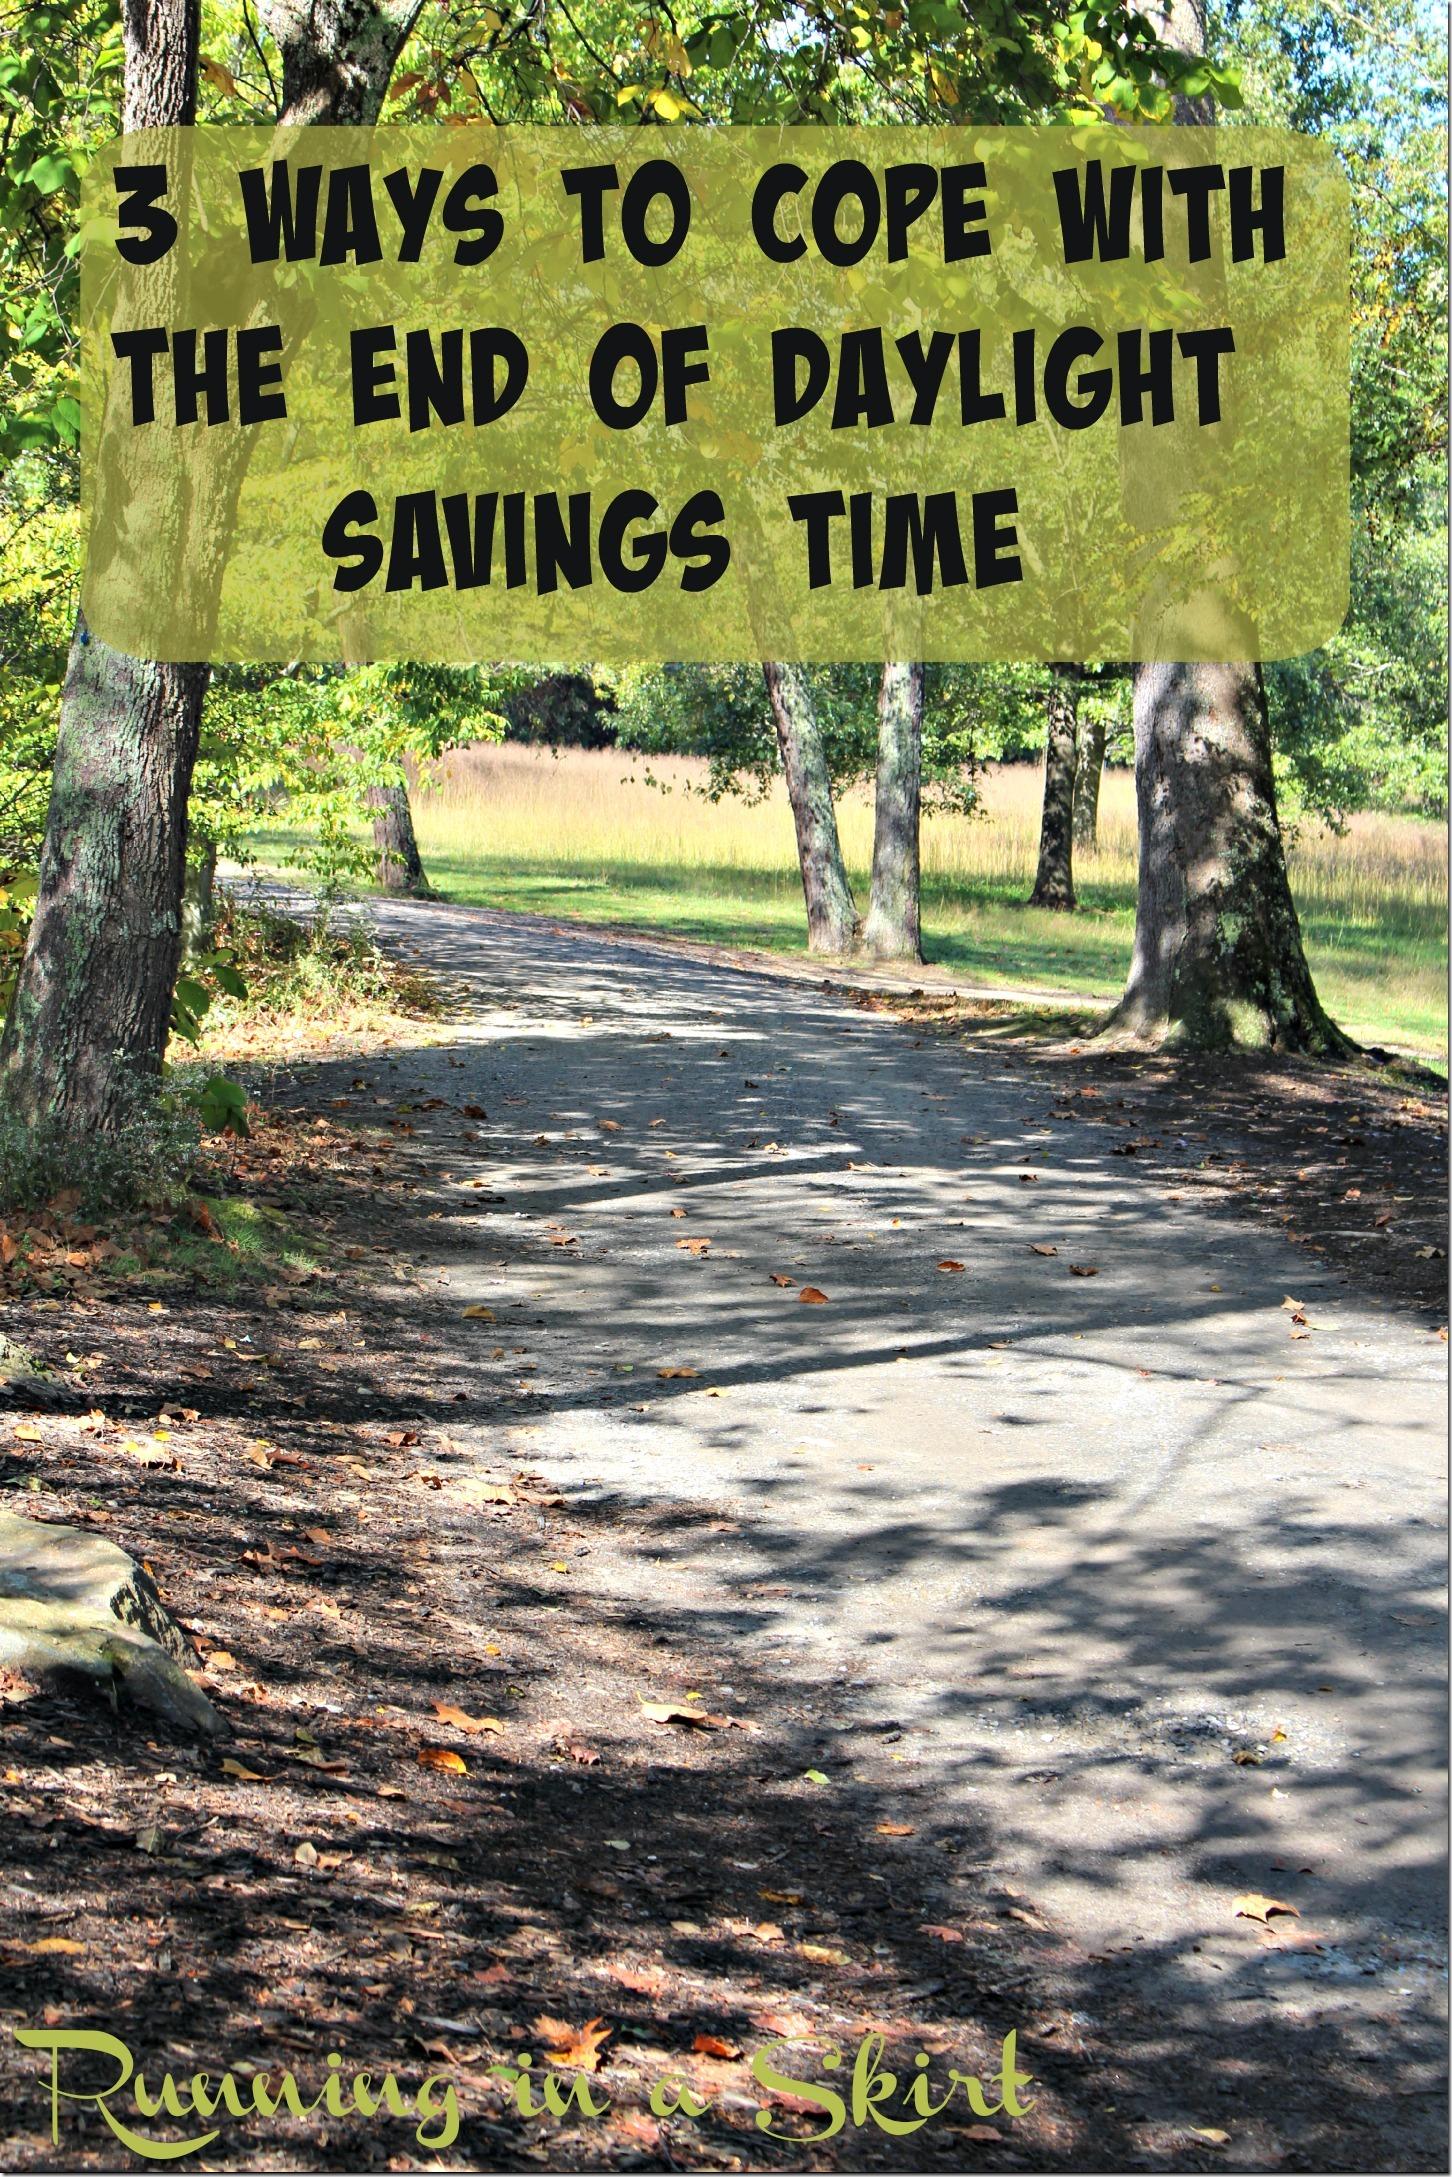 end-of-daylight-savings-time